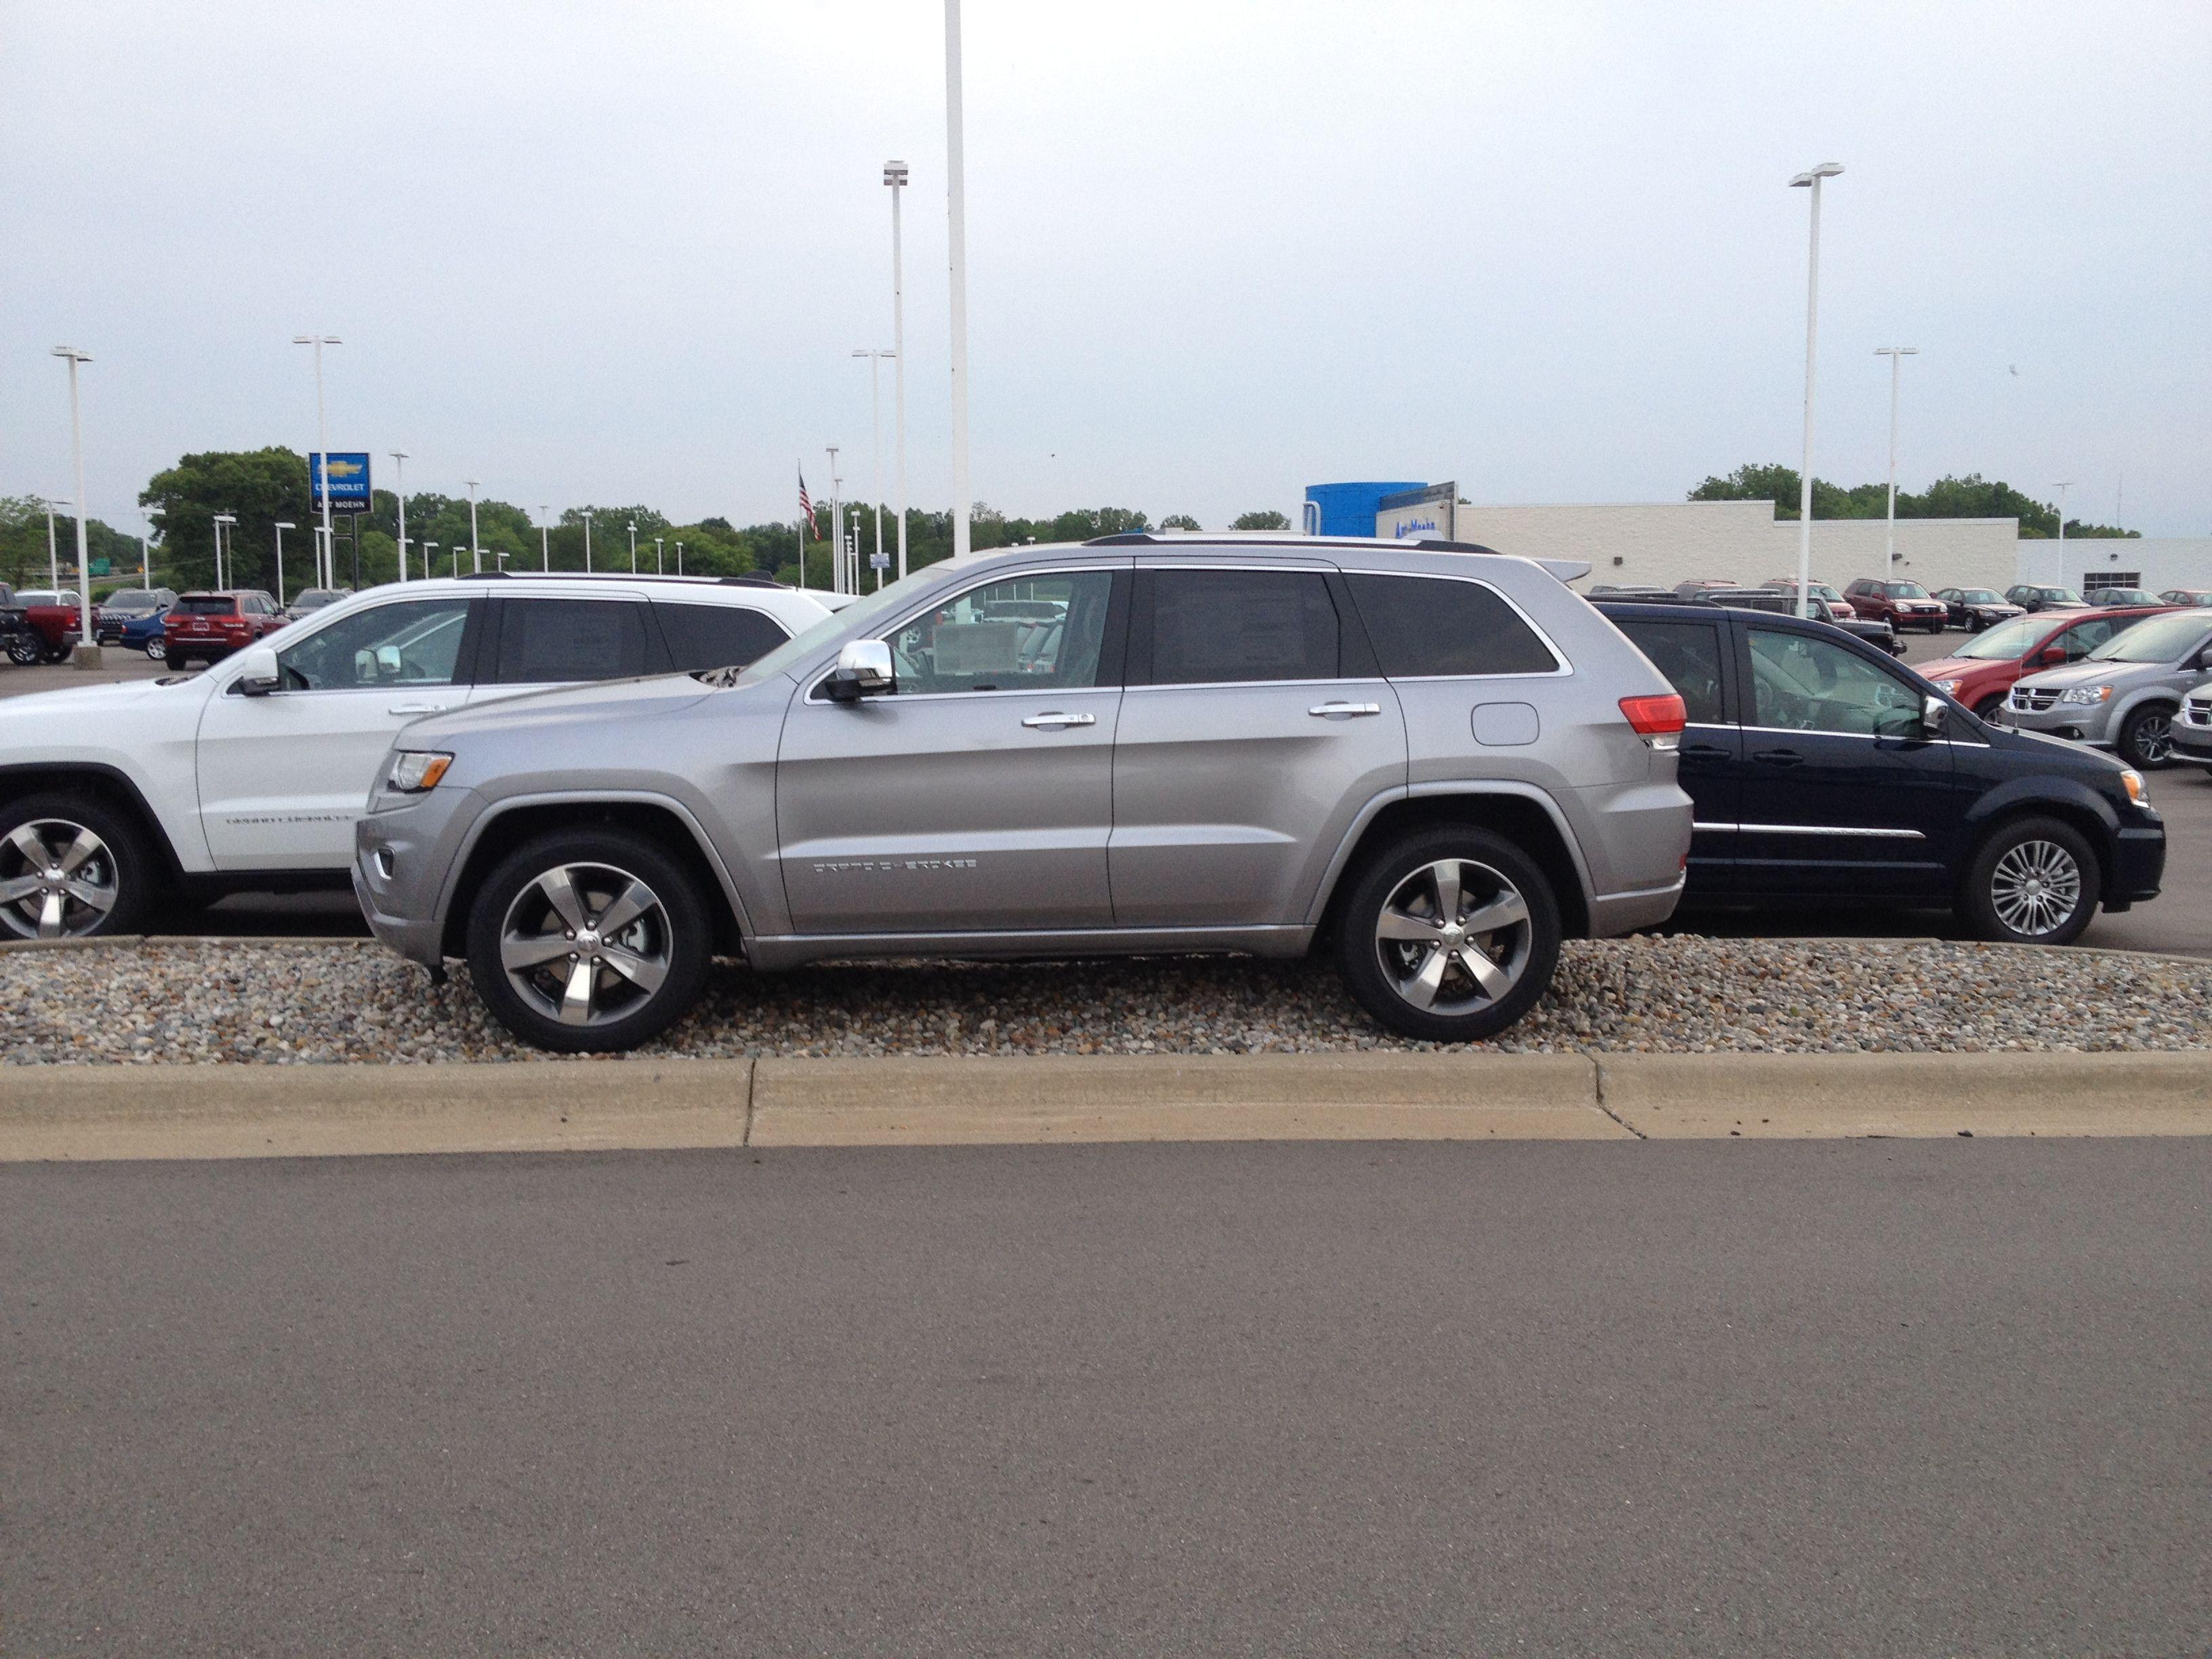 grand at x auto show laredo toledo youtube cherokee watch jeep